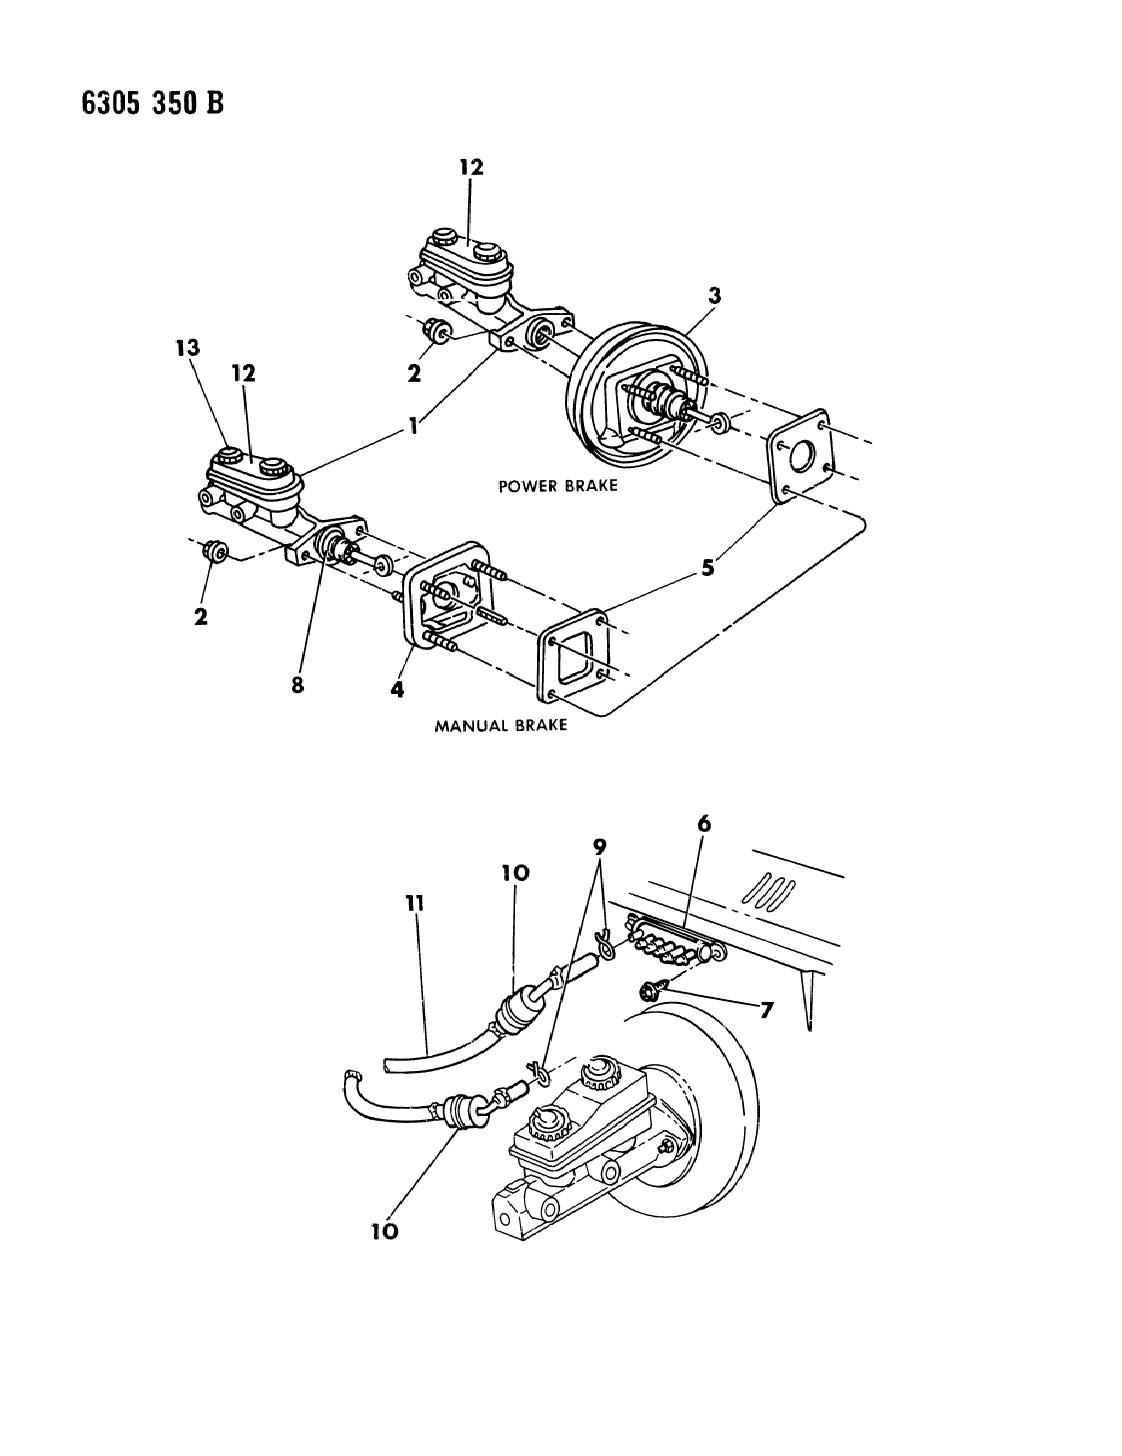 1987 Dodge Dakota Booster - Master Cylinder